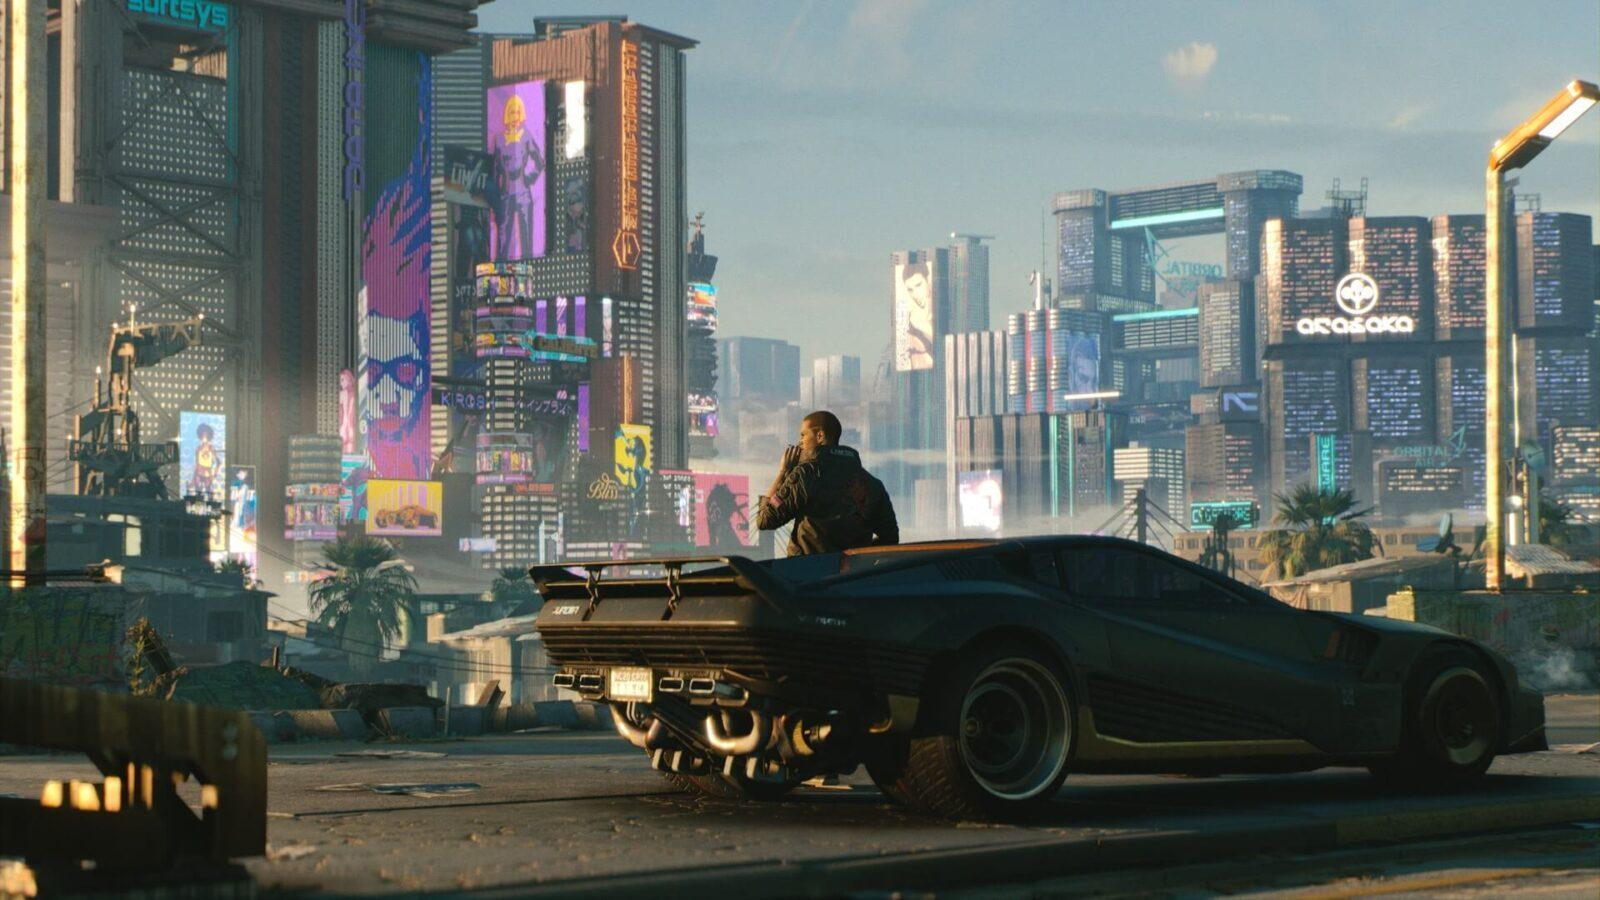 Jocuri noi decembrie 2020 pe PS4, PS5, Xbox One, Series X, Switch si PC